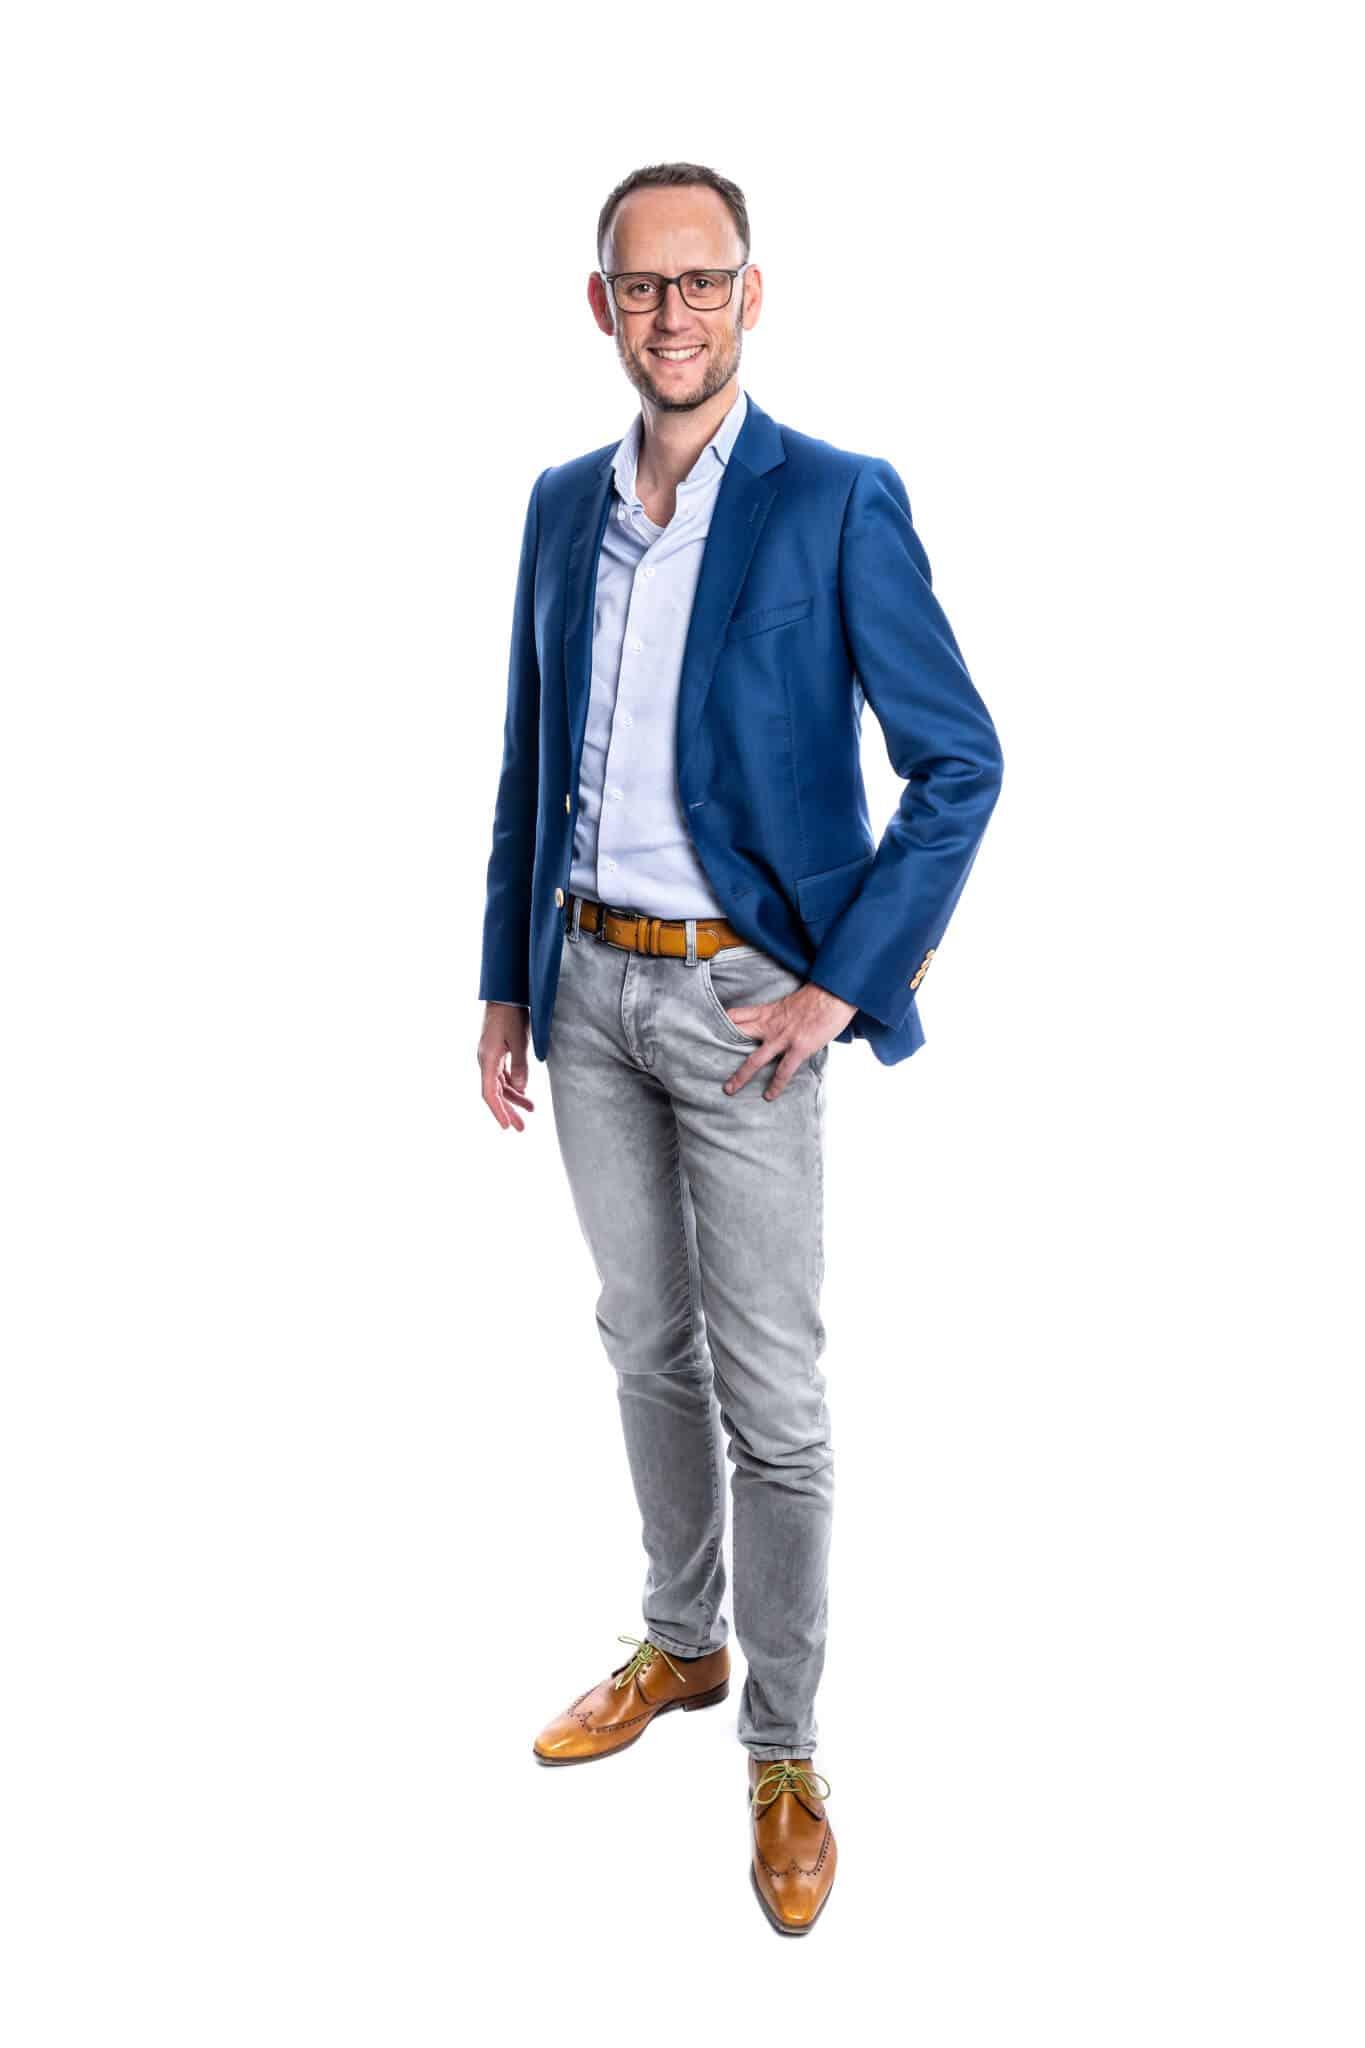 Emile Jansen